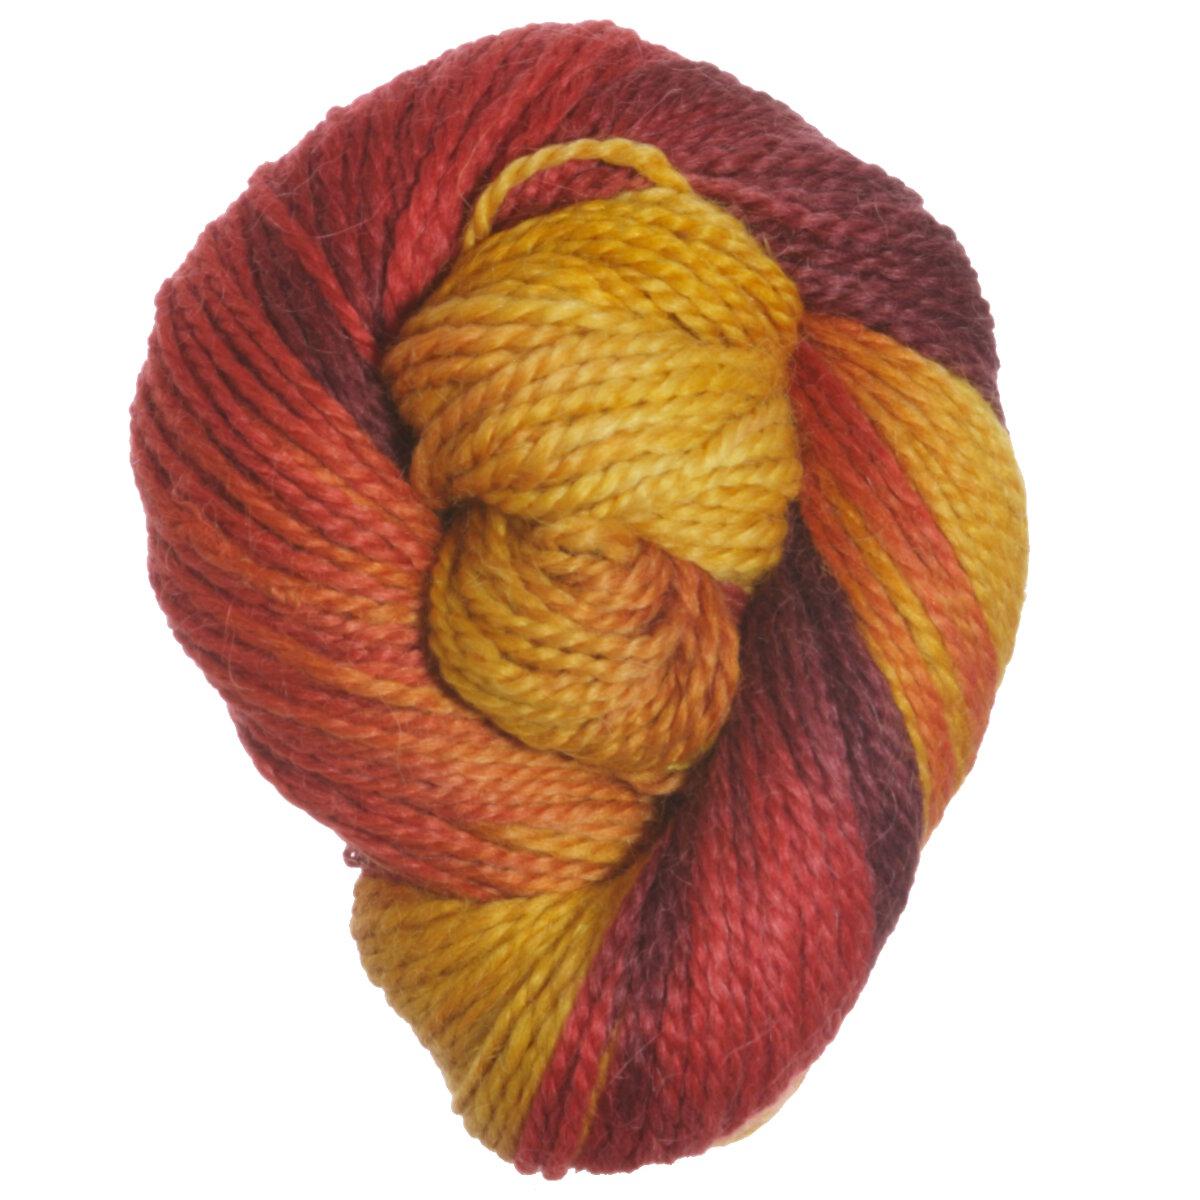 Aran Yarn : Rowan Fine Art Aran Yarn at Jimmy Beans Wool